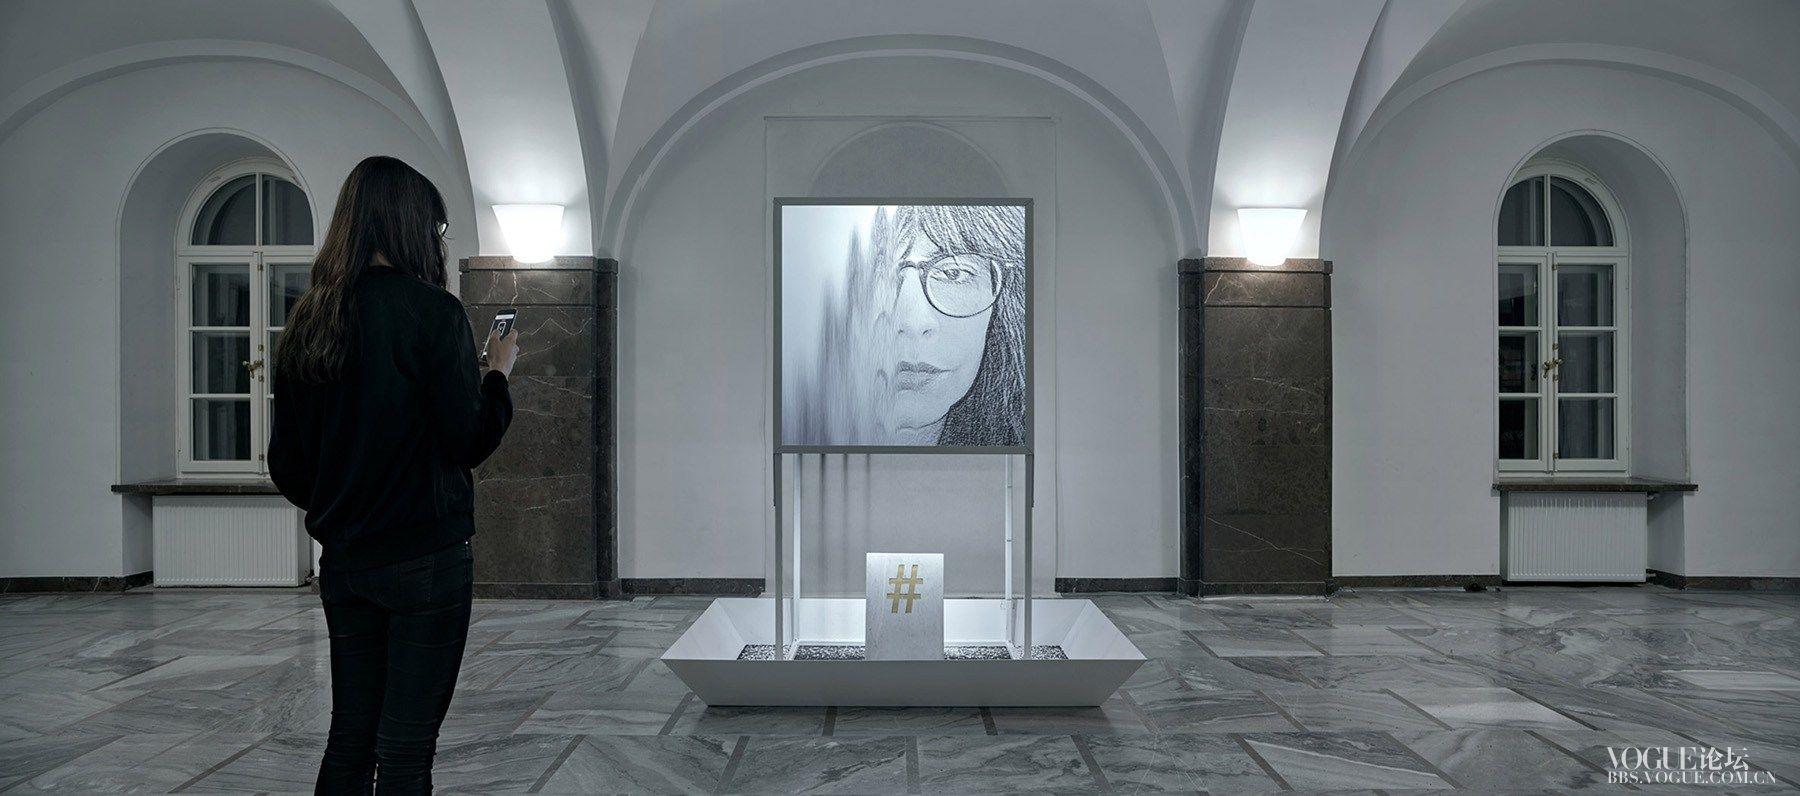 hash-2-ash-selfie-digital-installation.jpg